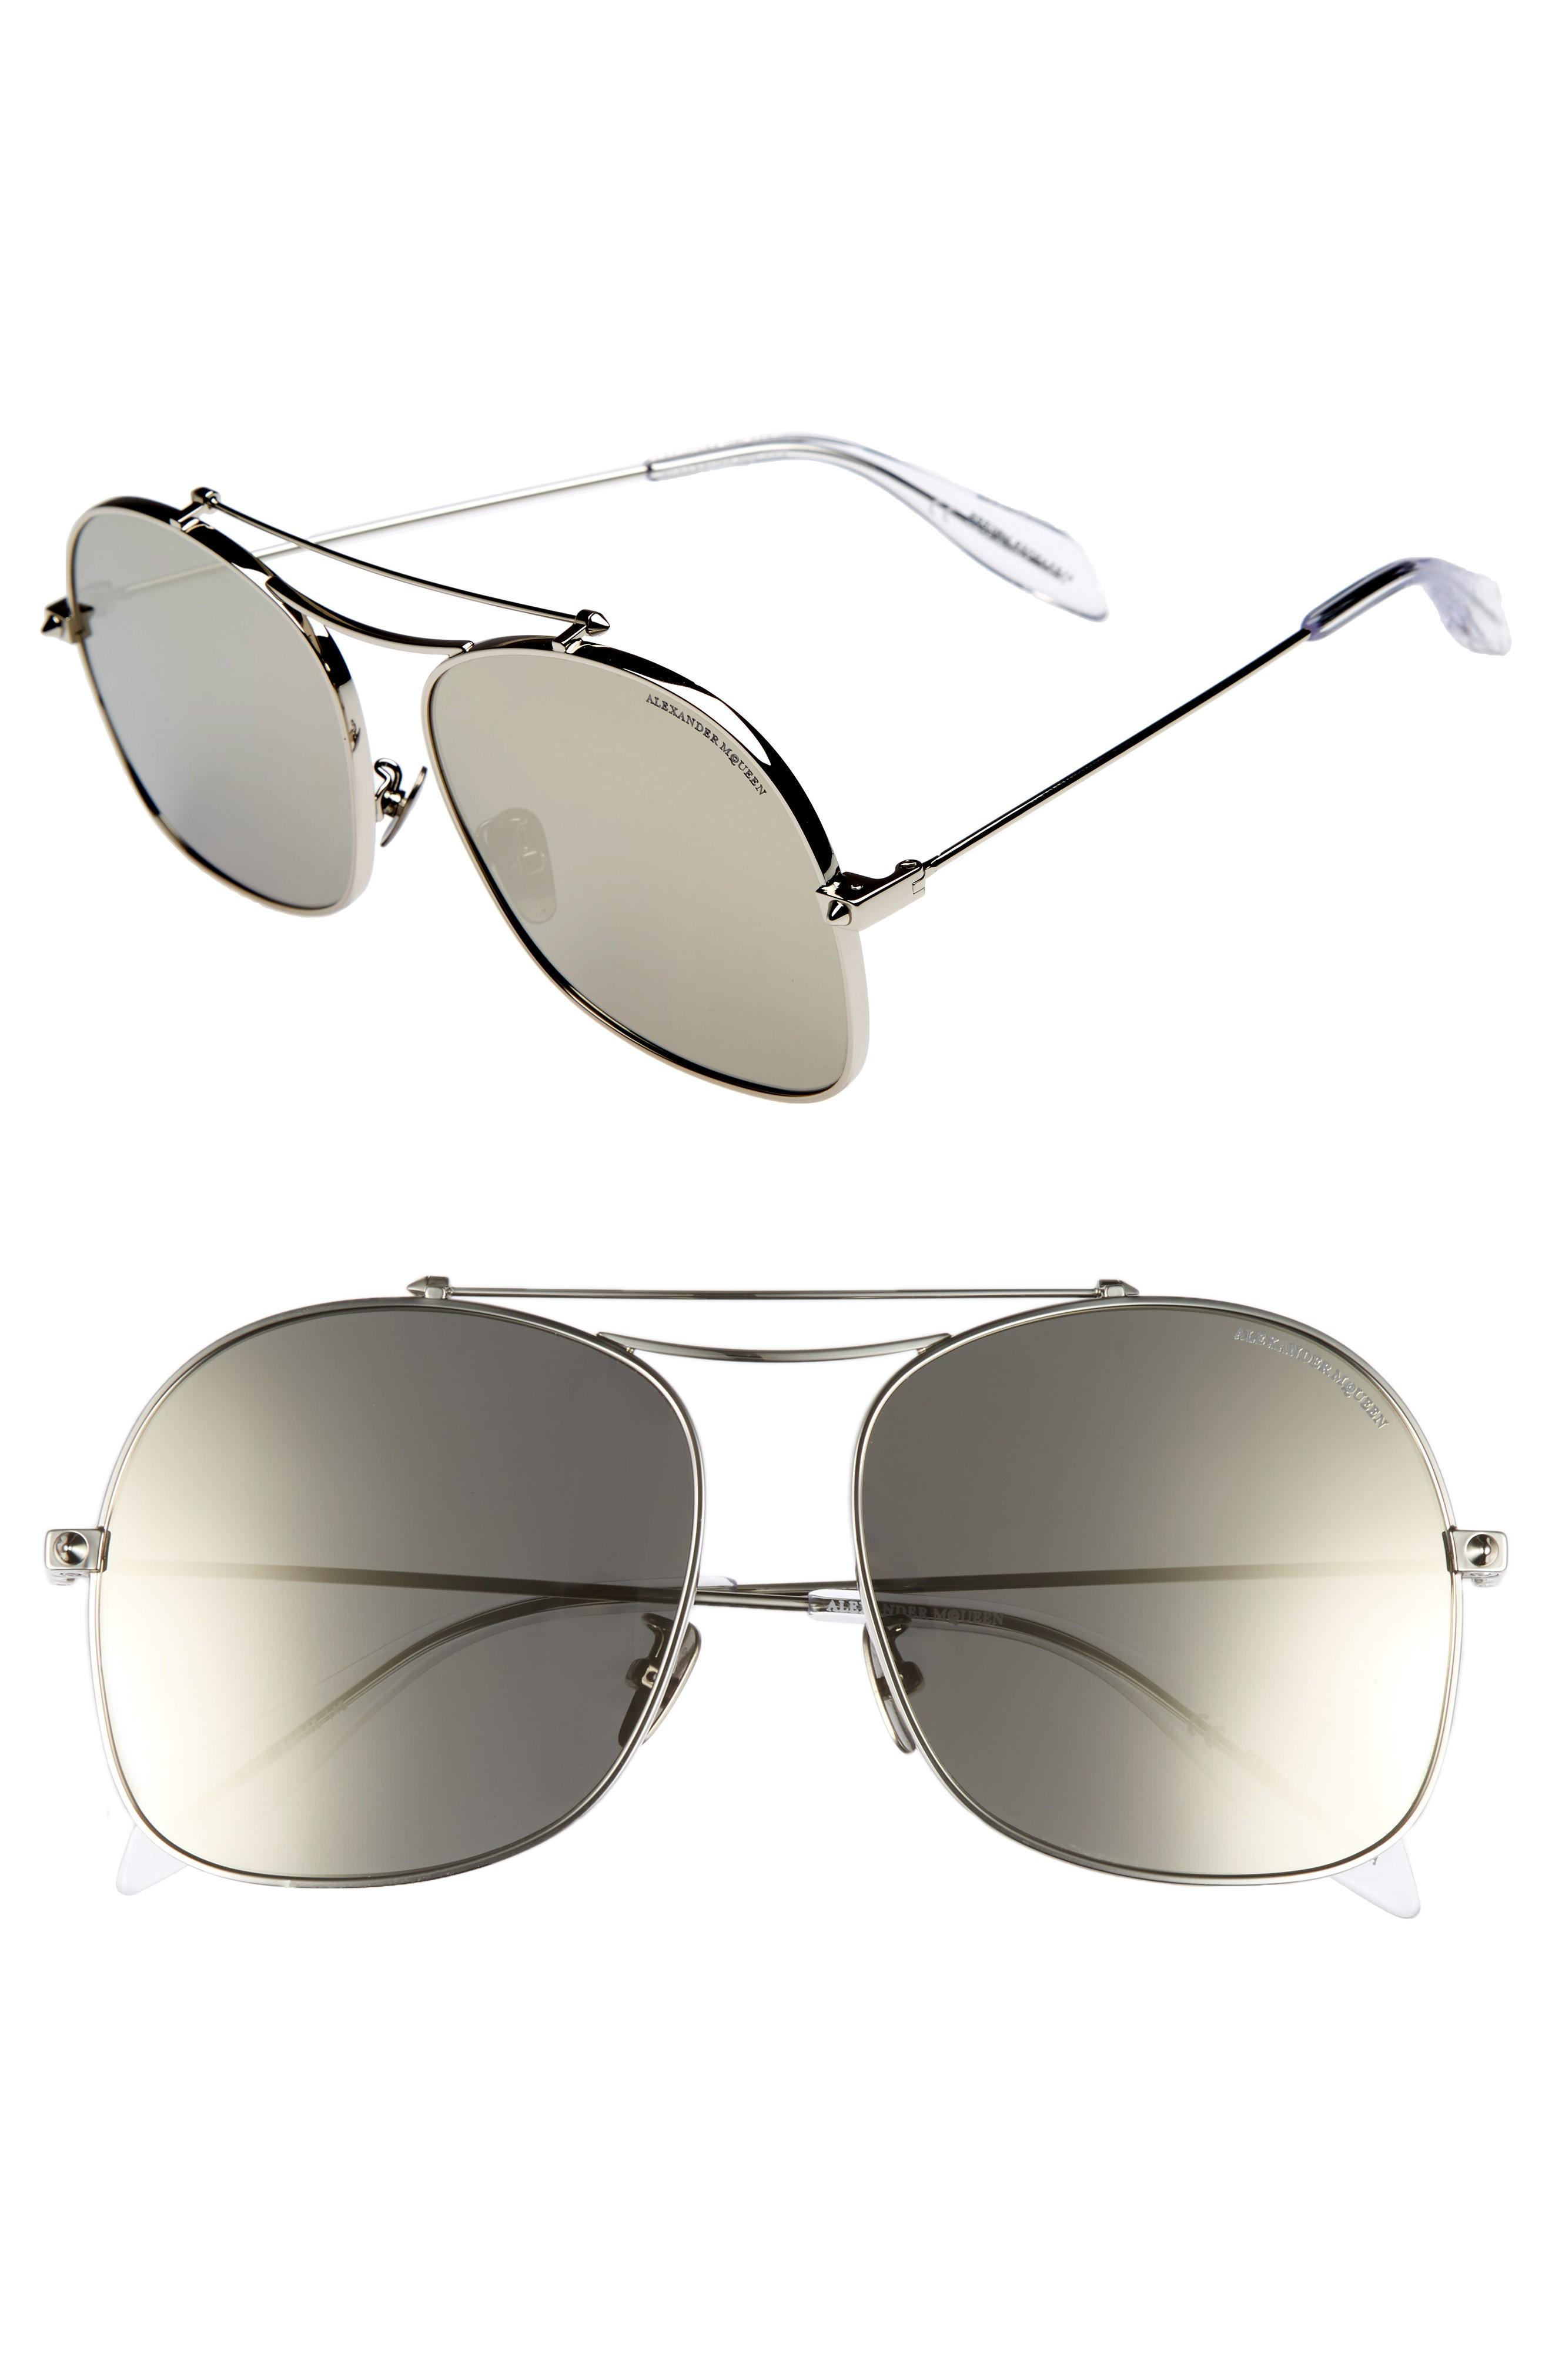 326e5f6a2081 Alexander Mcqueen 59Mm Aviator Sunglasses In Silver | ModeSens